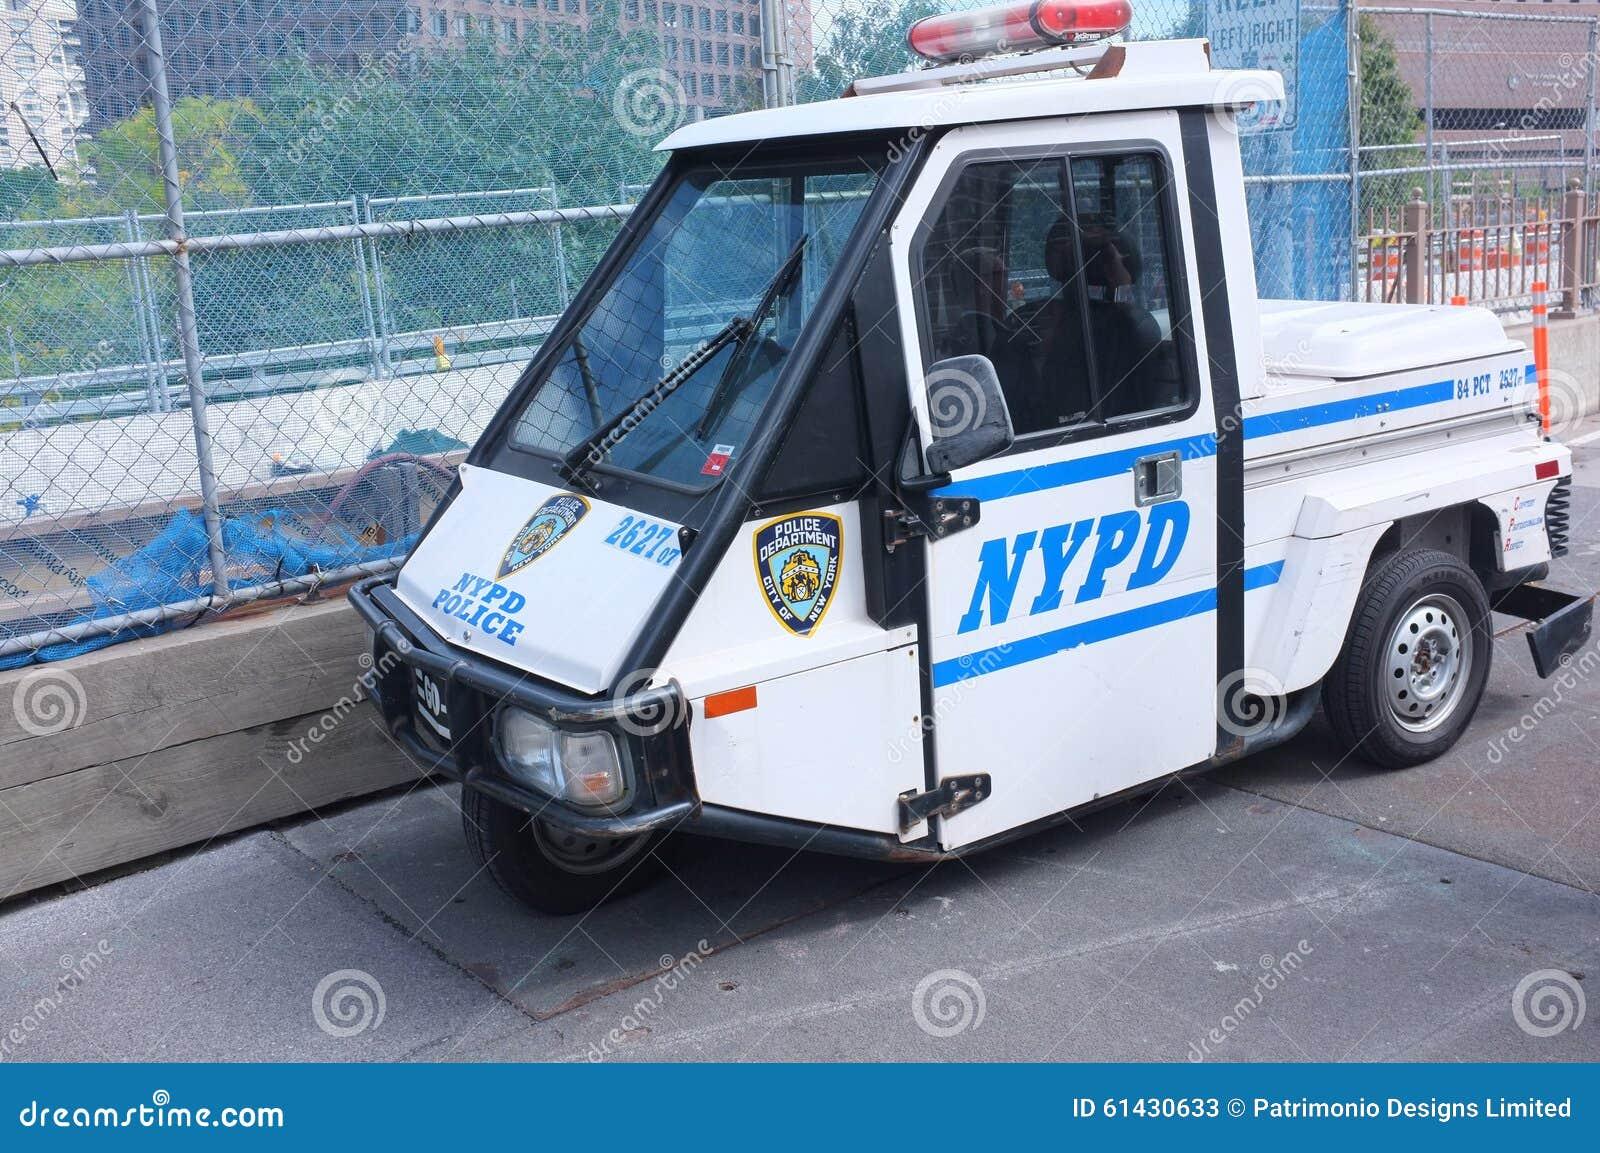 NYPD Police Scooter 3 Wheeler Car Editorial Stock Photo